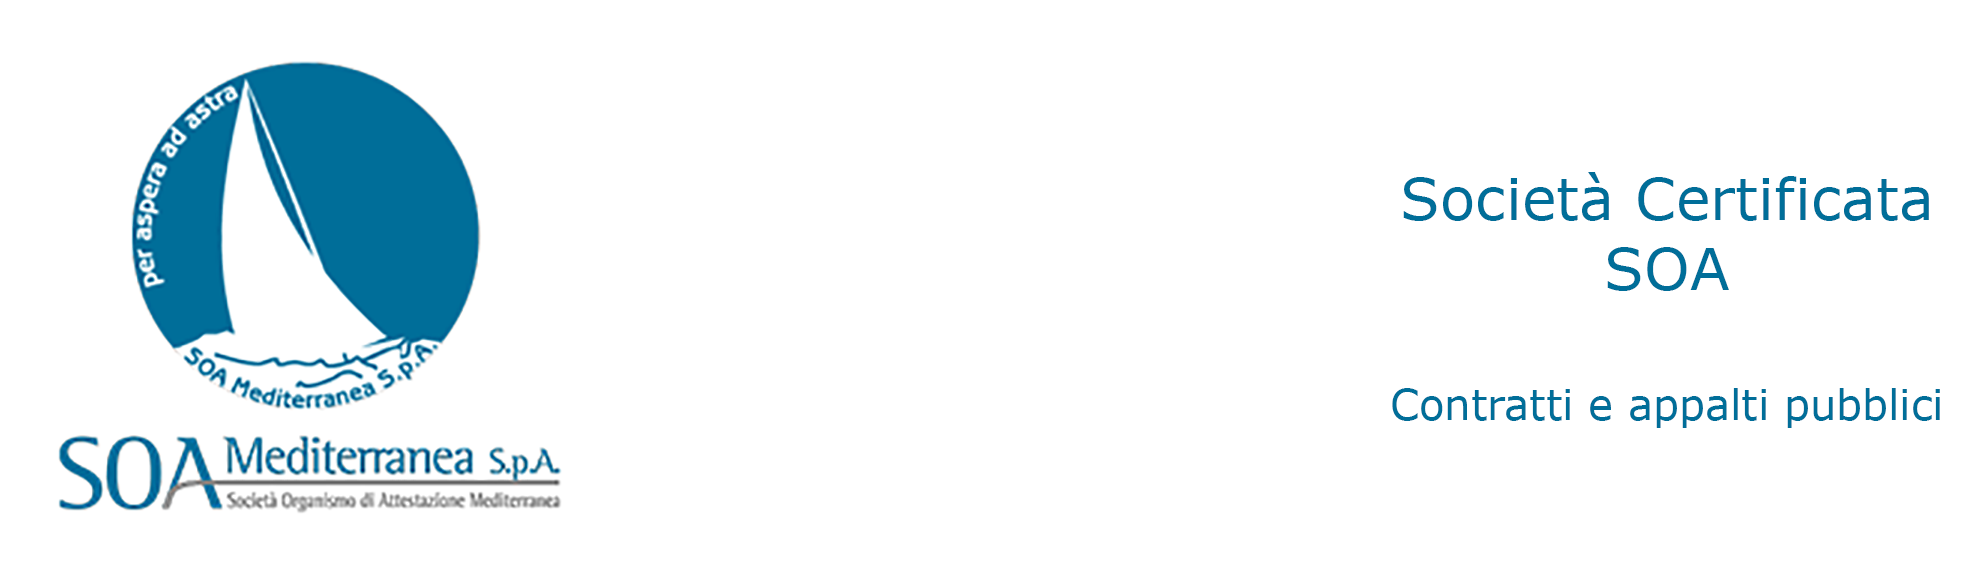 Sicedil Srl è un azienda certificata SOA |  SicEdil Srl